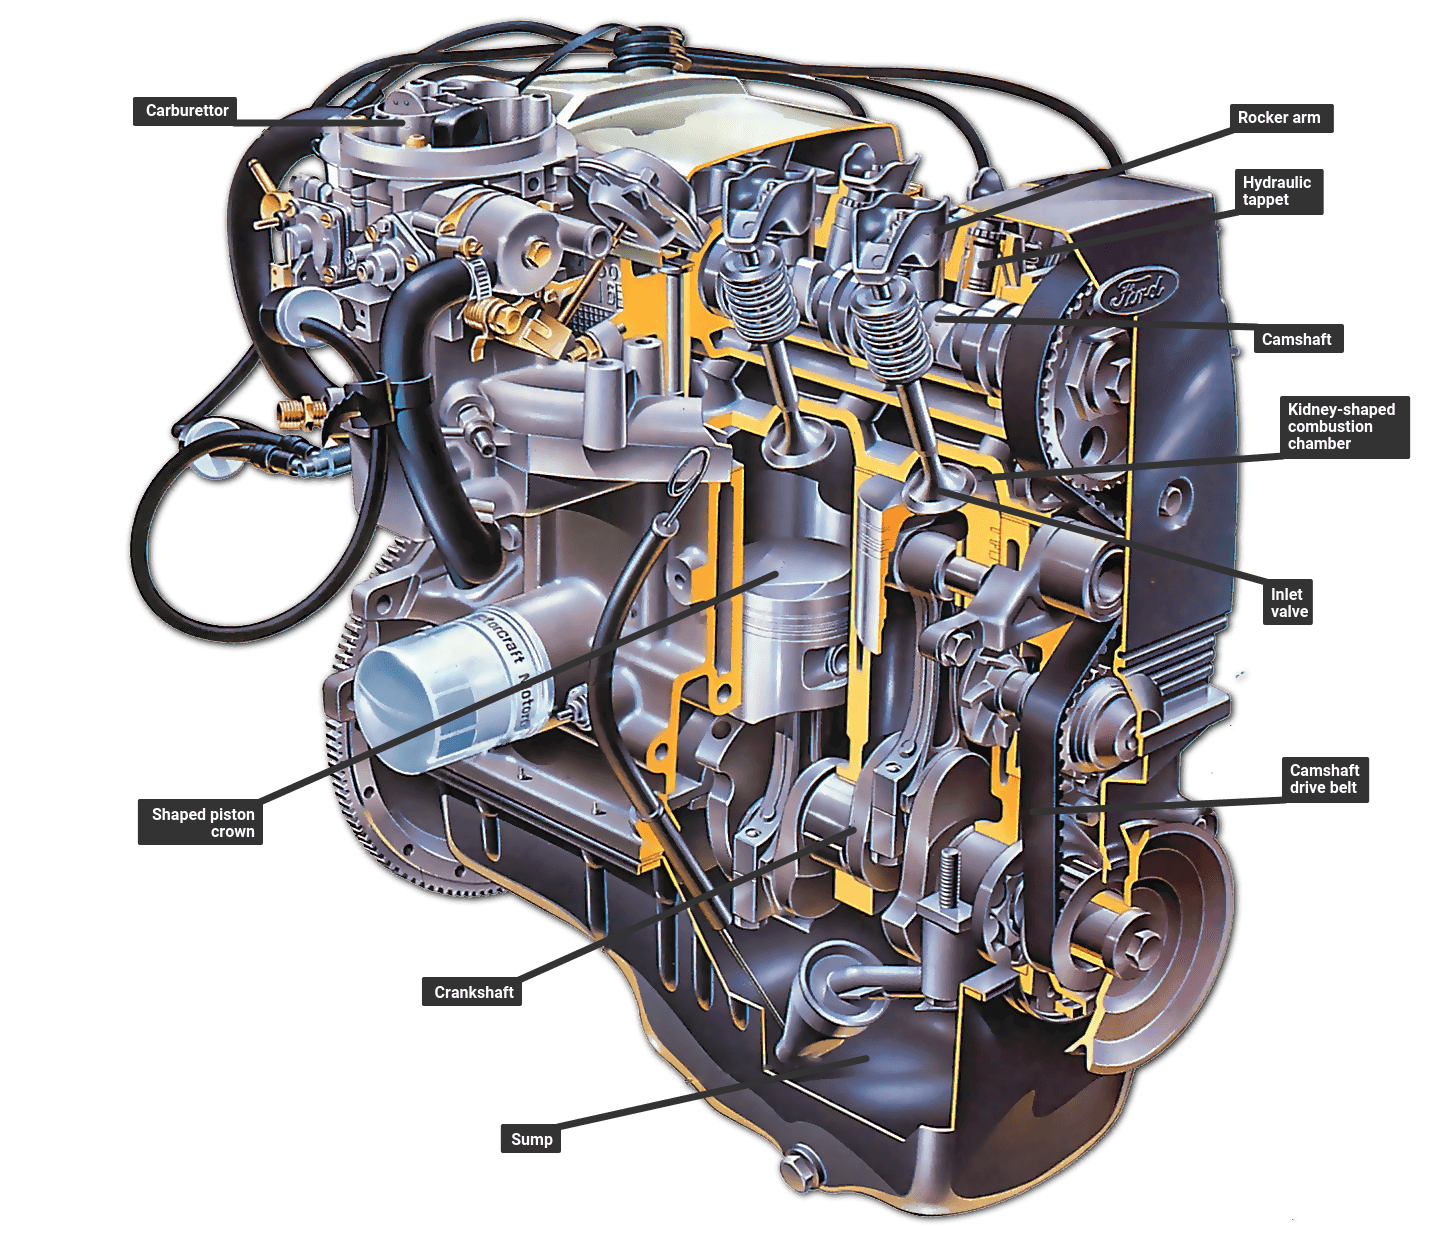 Lean Burn Engines How A Car Works